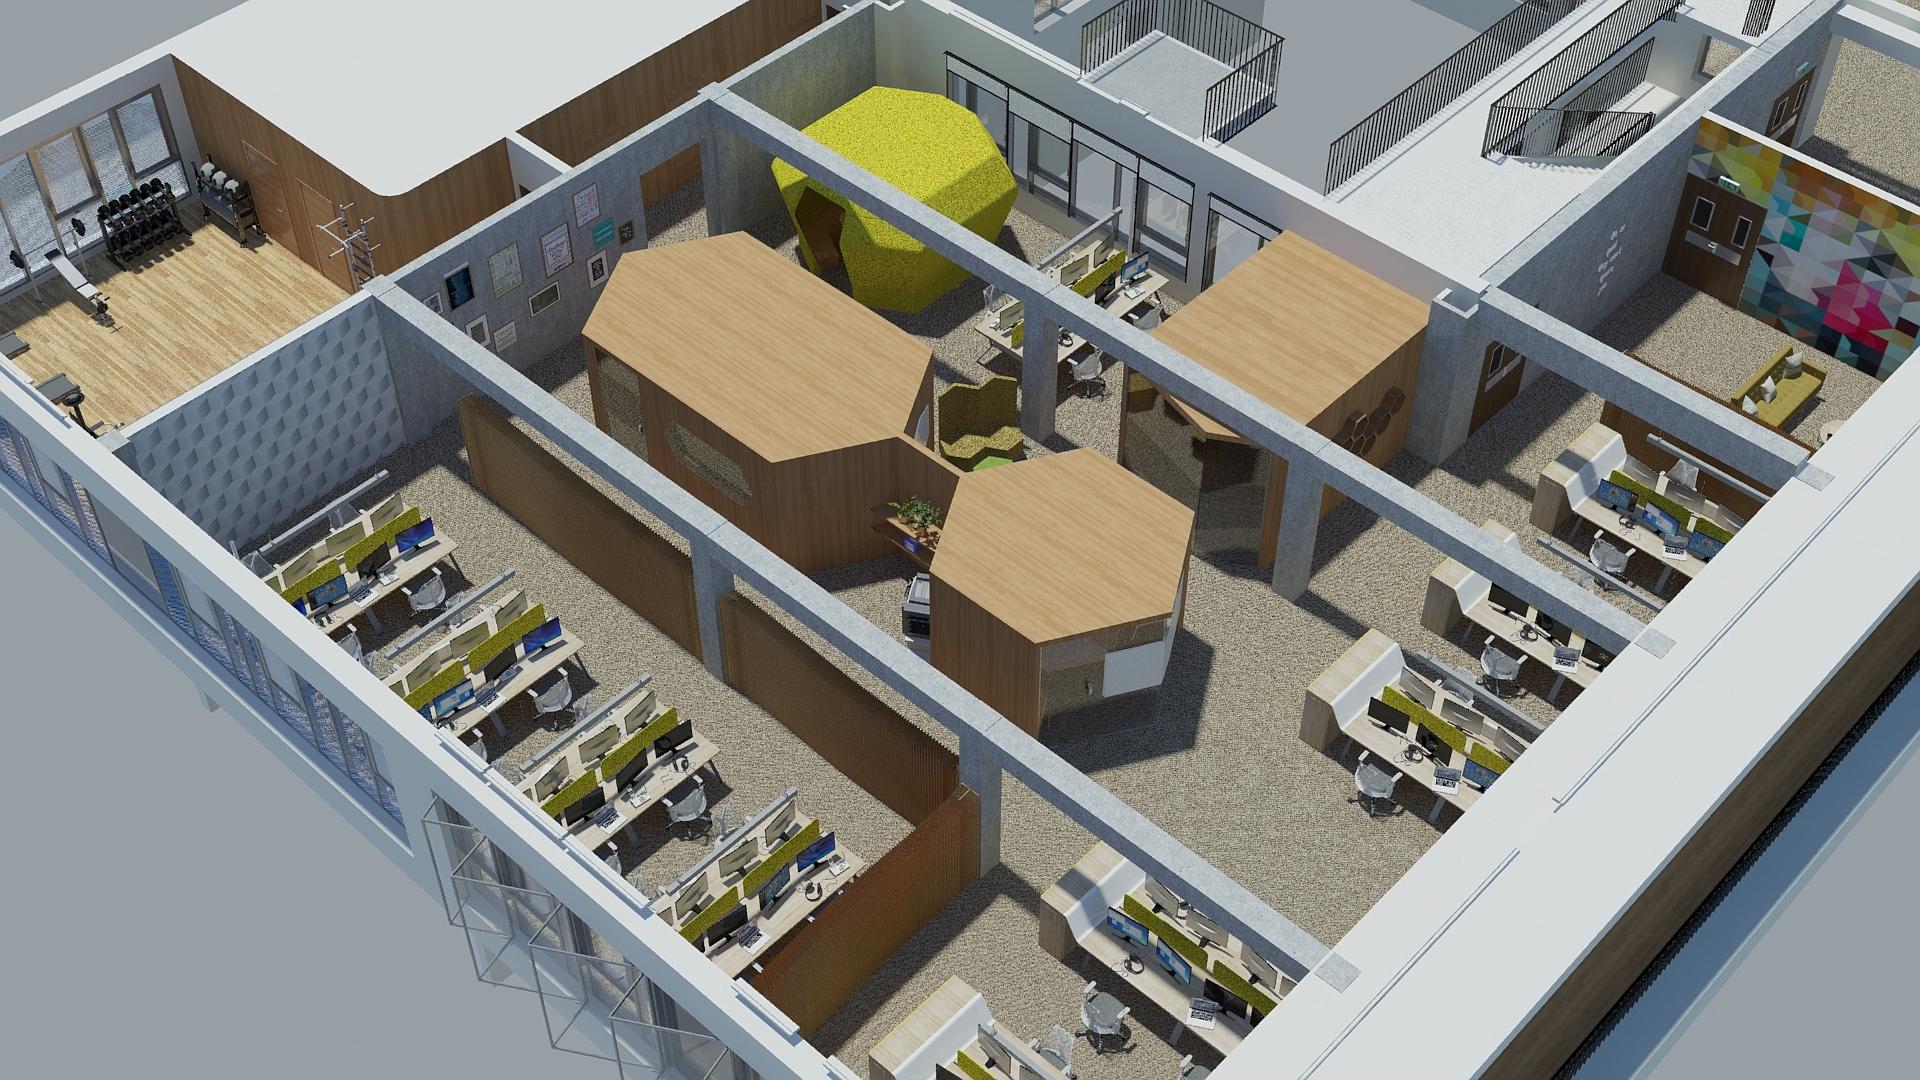 Rendu 3D - Space planing